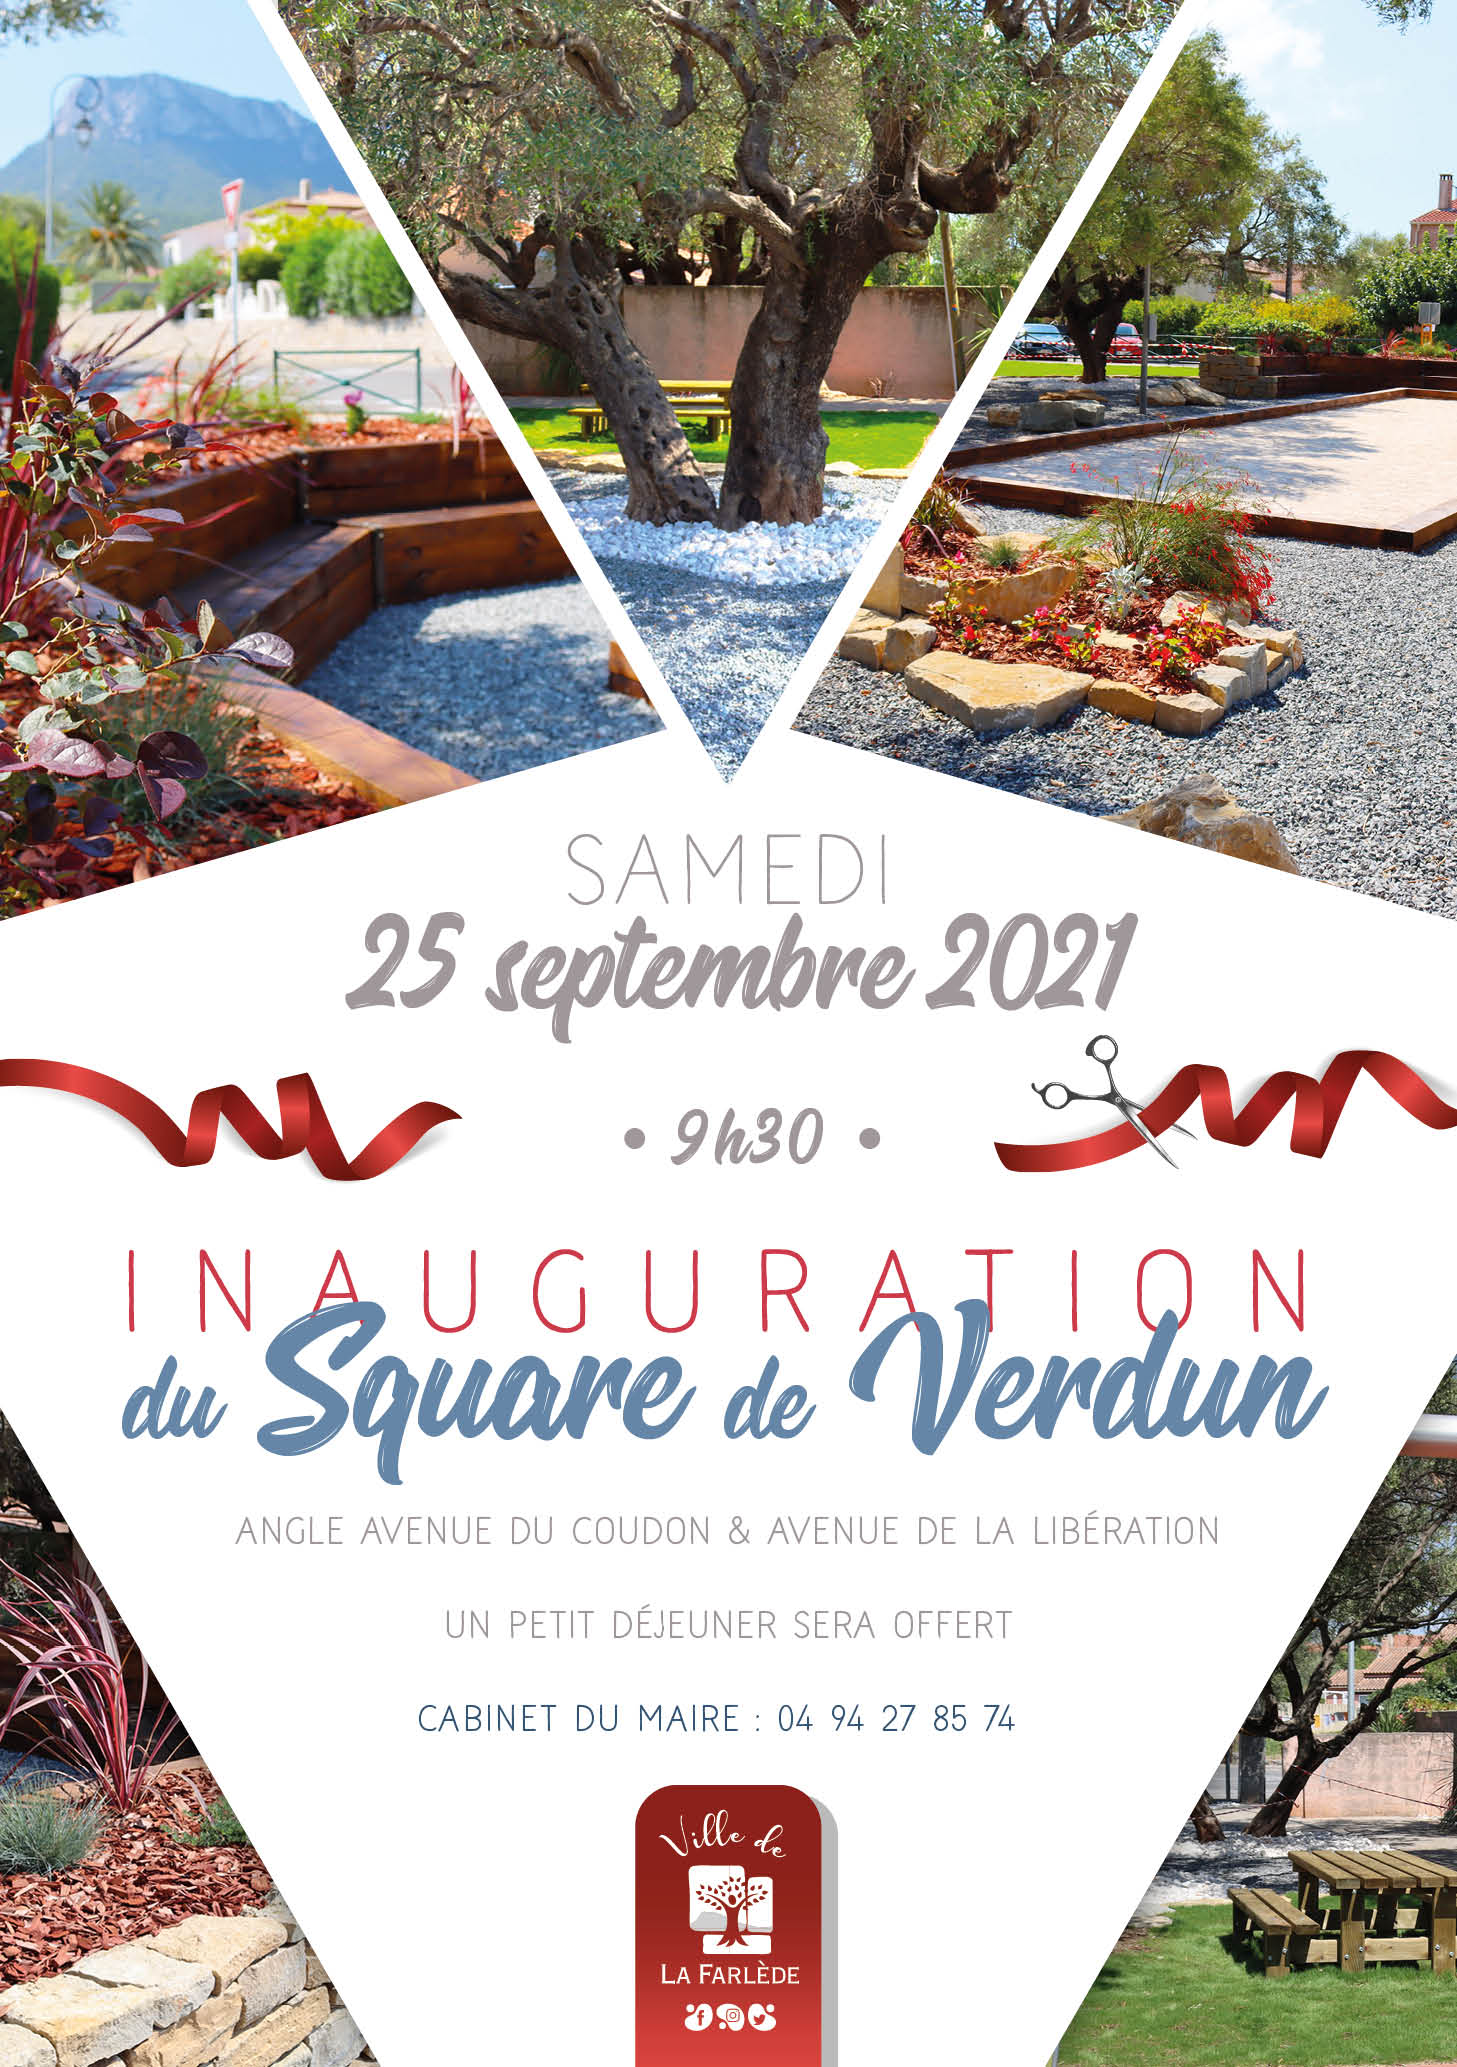 Inauguration_square_verdun-web.jpg/411,31Ko